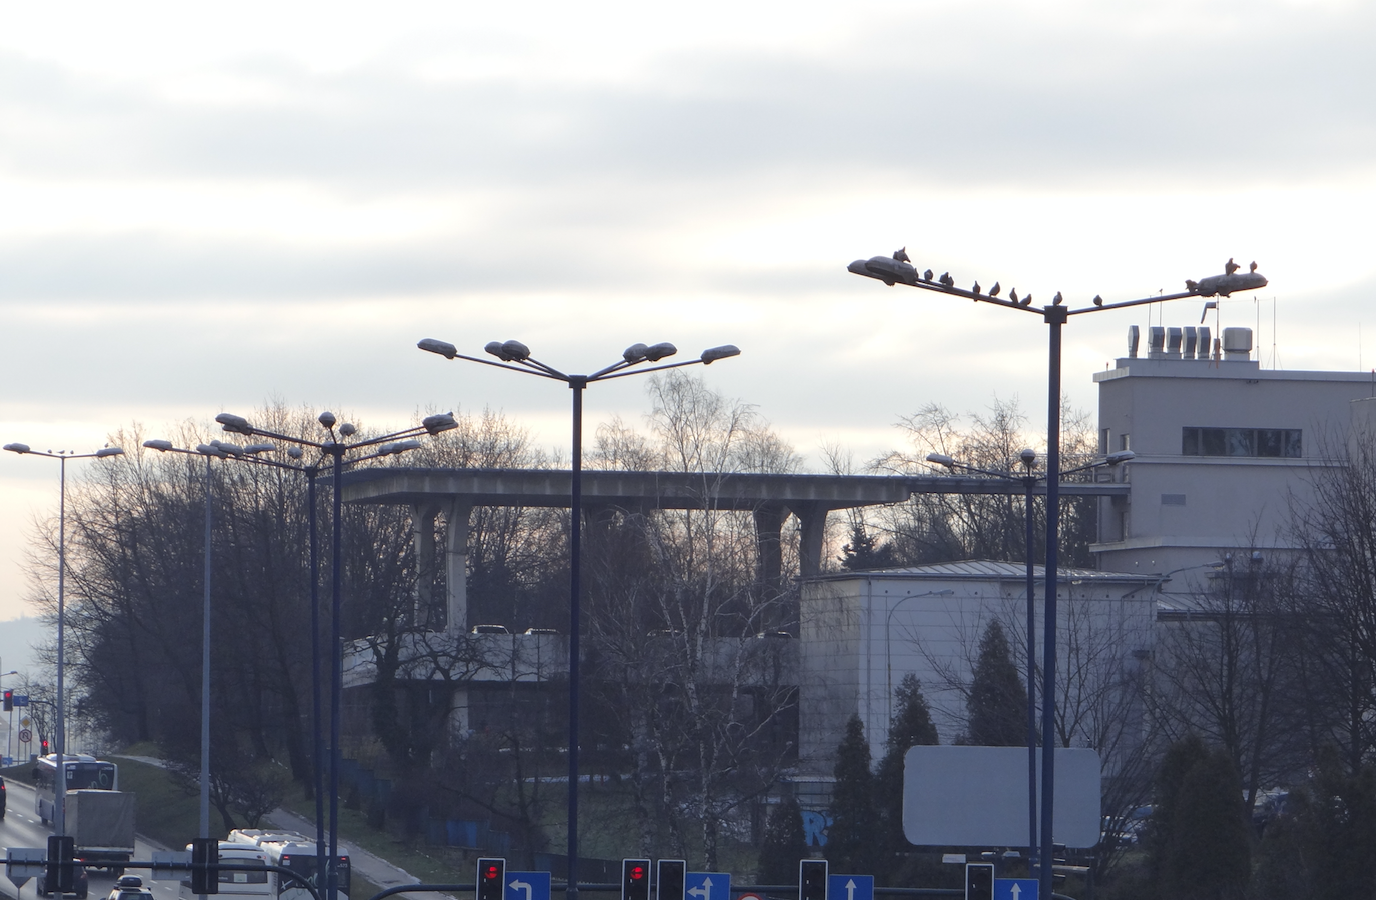 Heliport Kraków Prokocim. 2019 rok. Zdjęcie Karol Placha Hetman